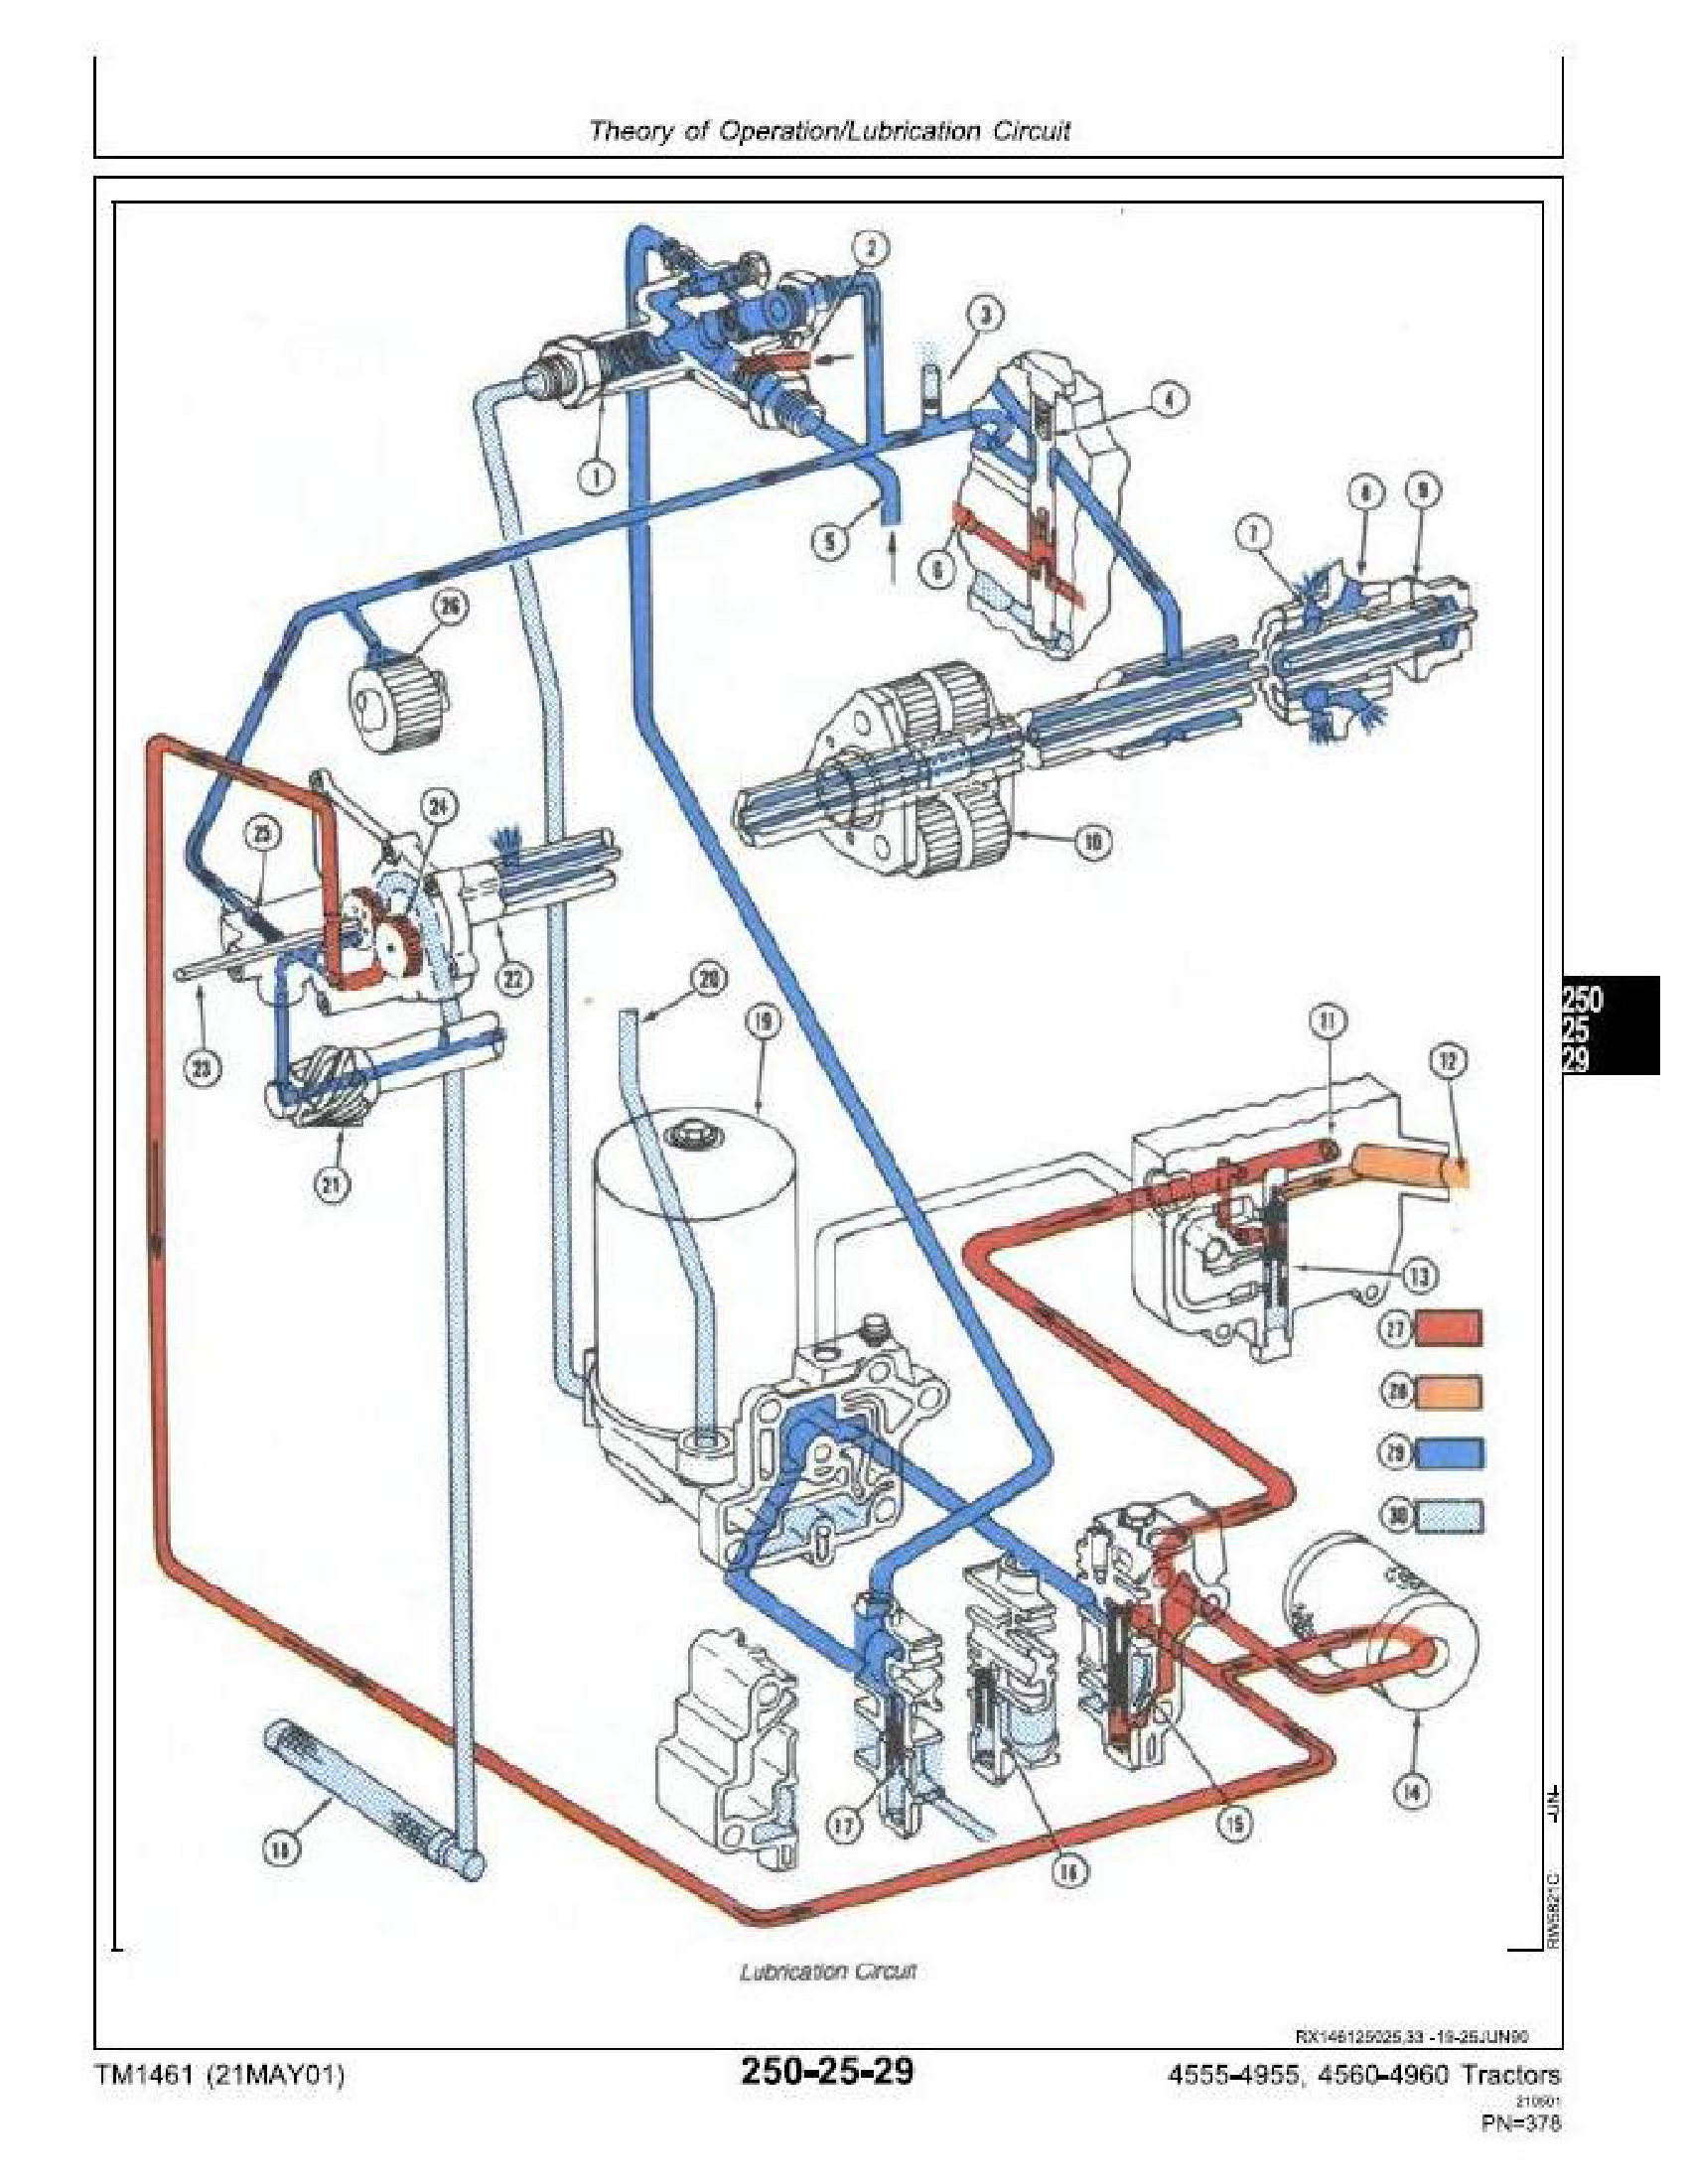 John Deere 4960 manual